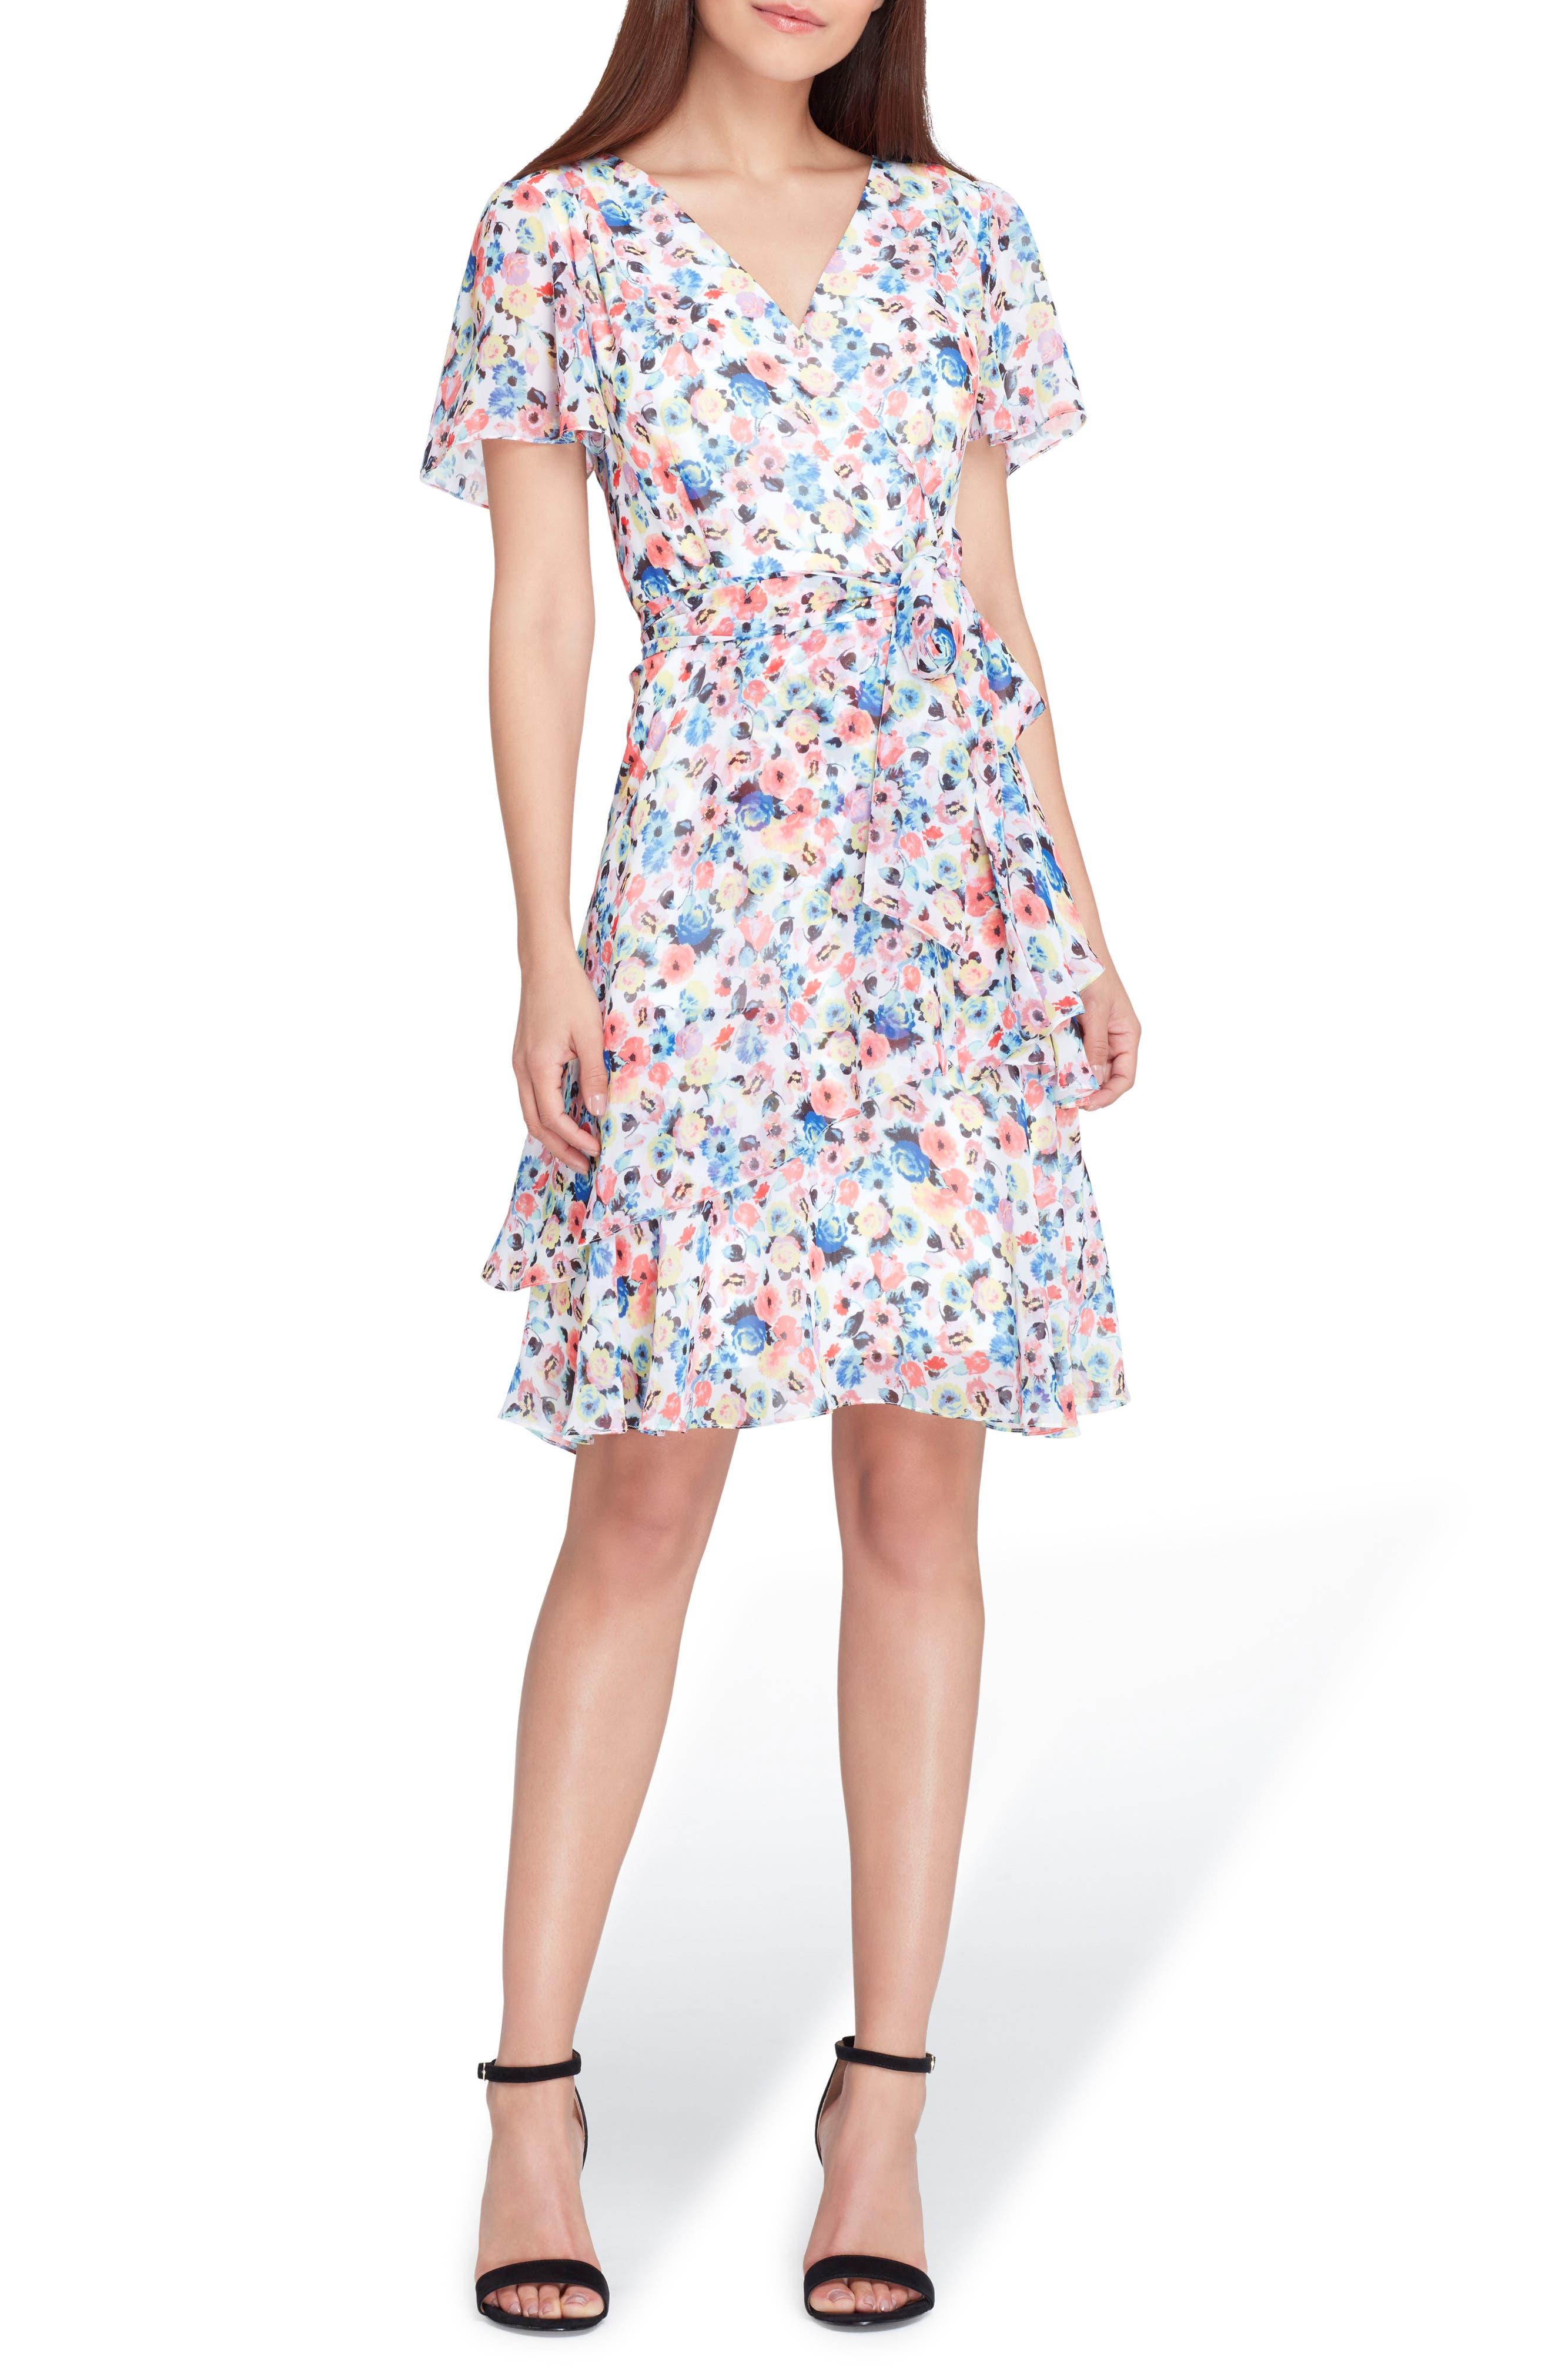 Floral Chiffon Faux Wrap Dress,                         Main,                         color, White/ Coral/ Royal